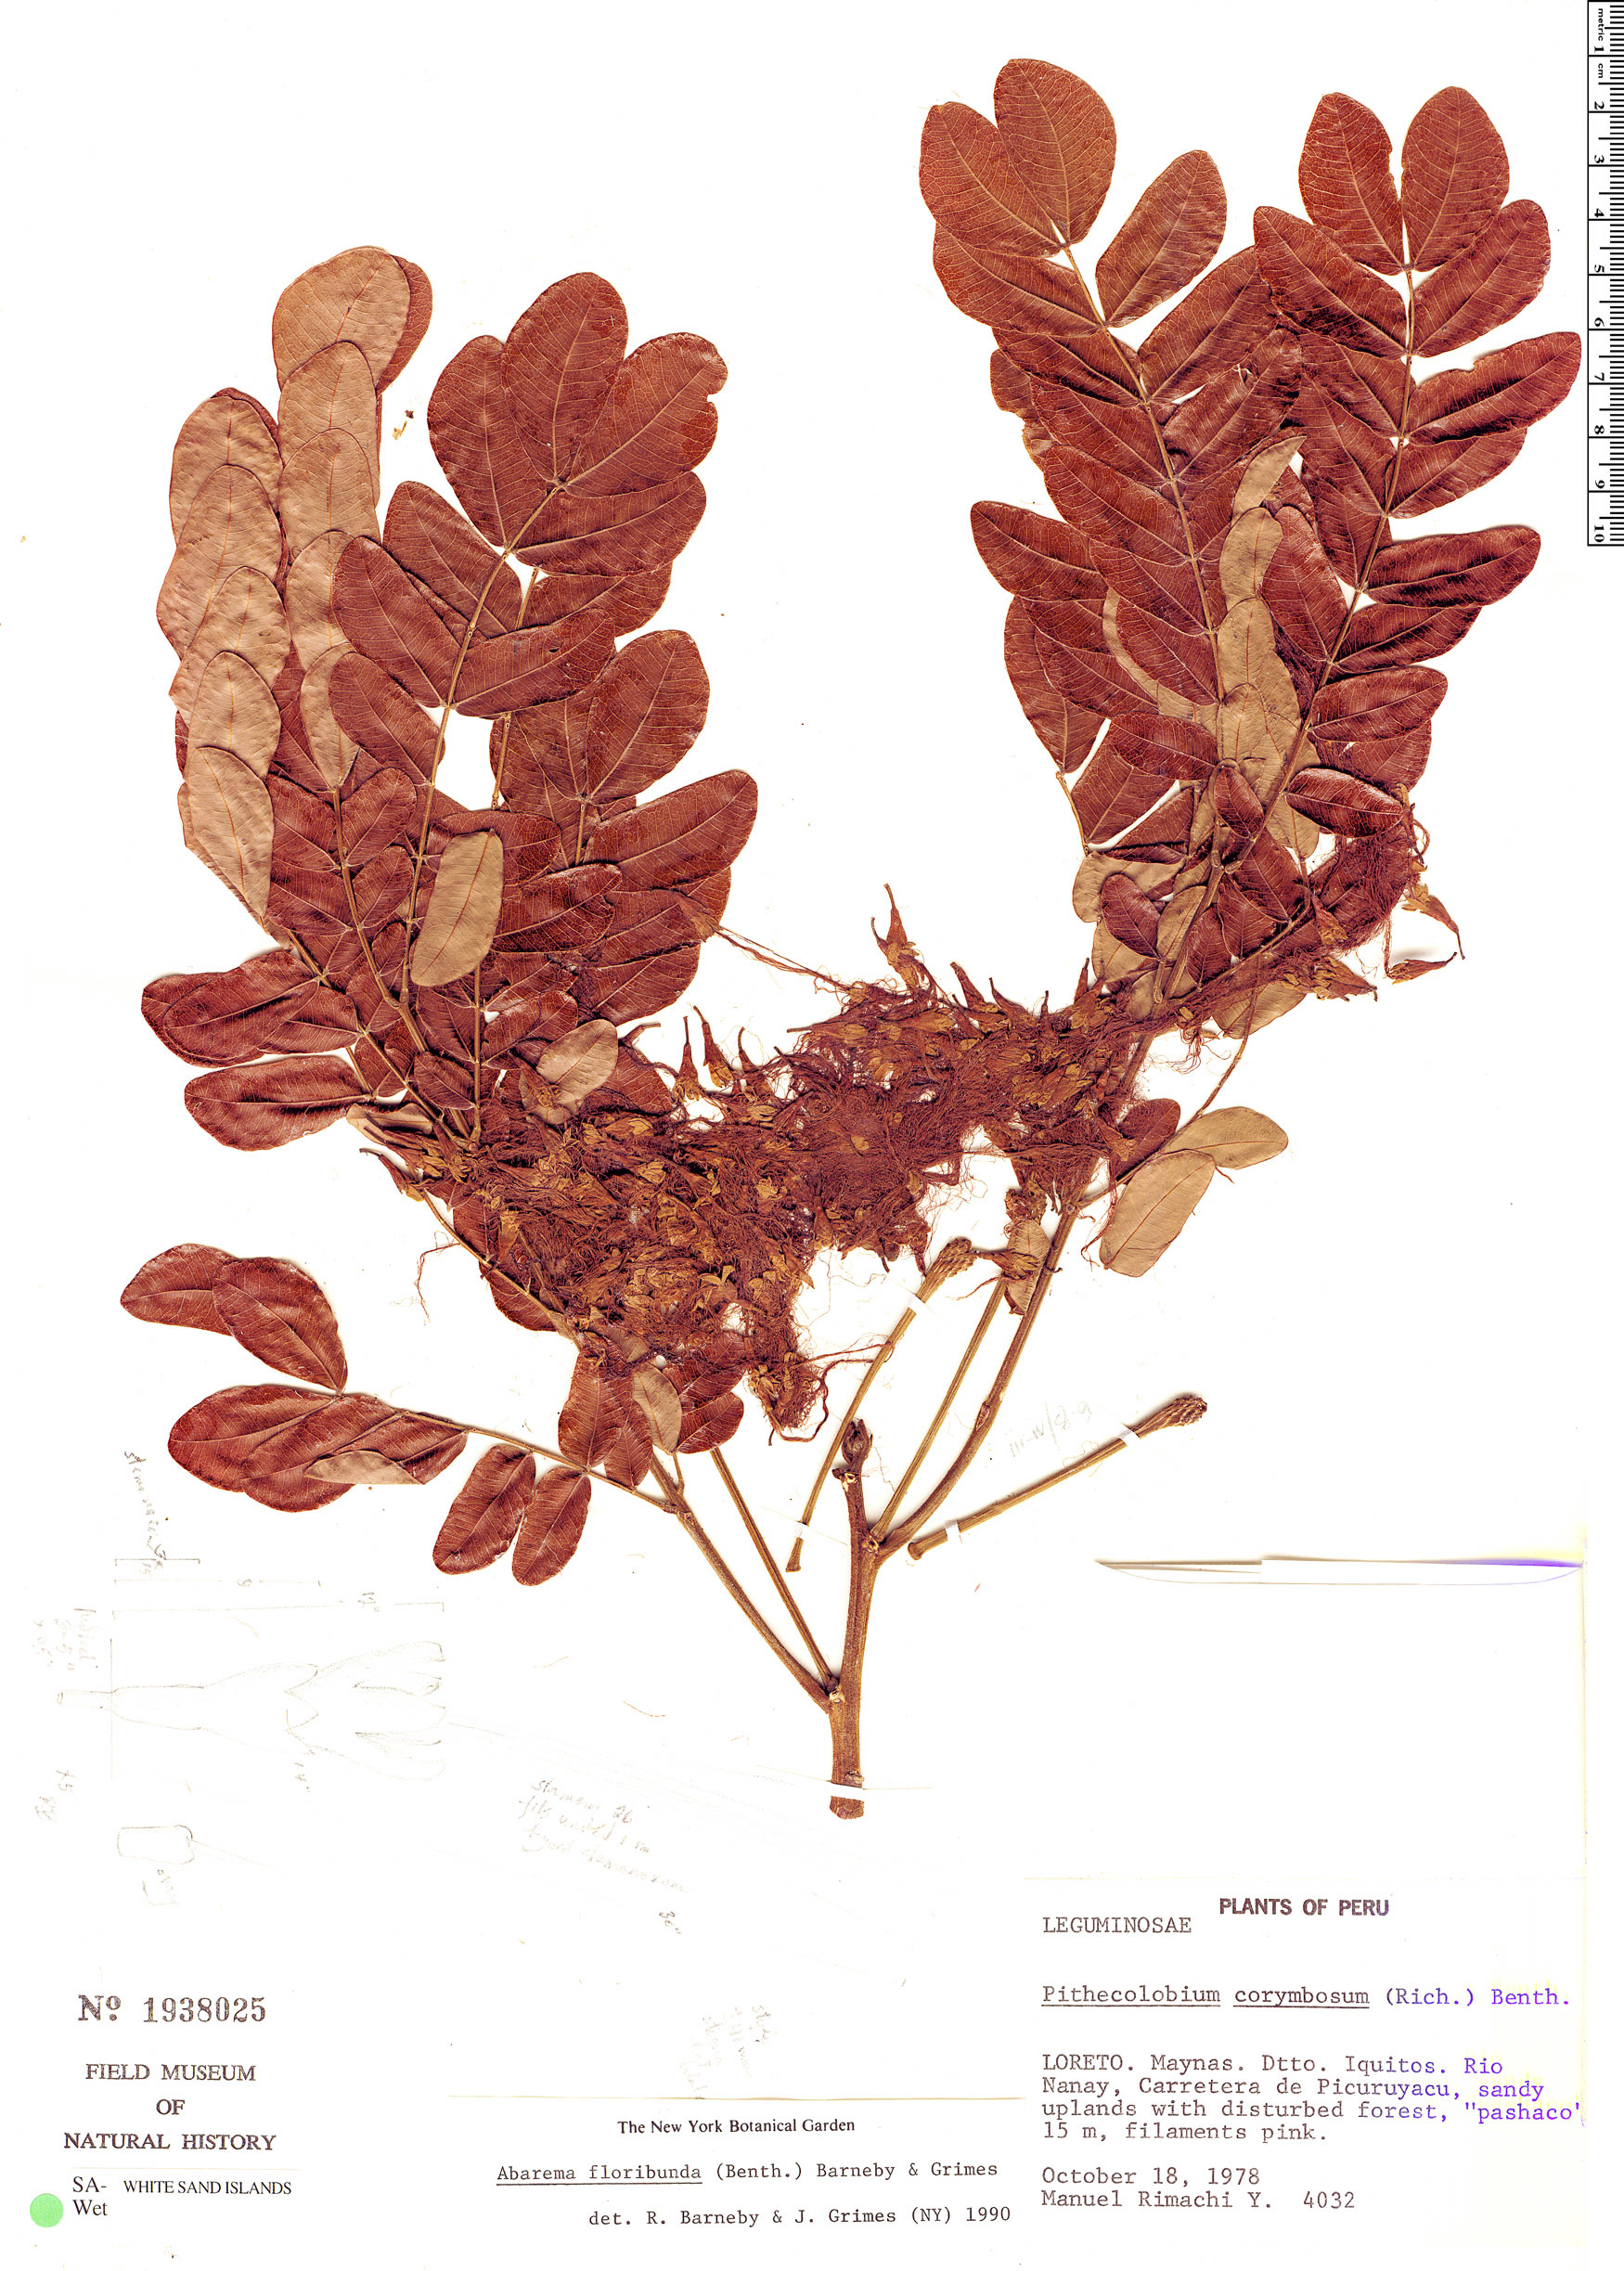 Specimen: Abarema floribunda